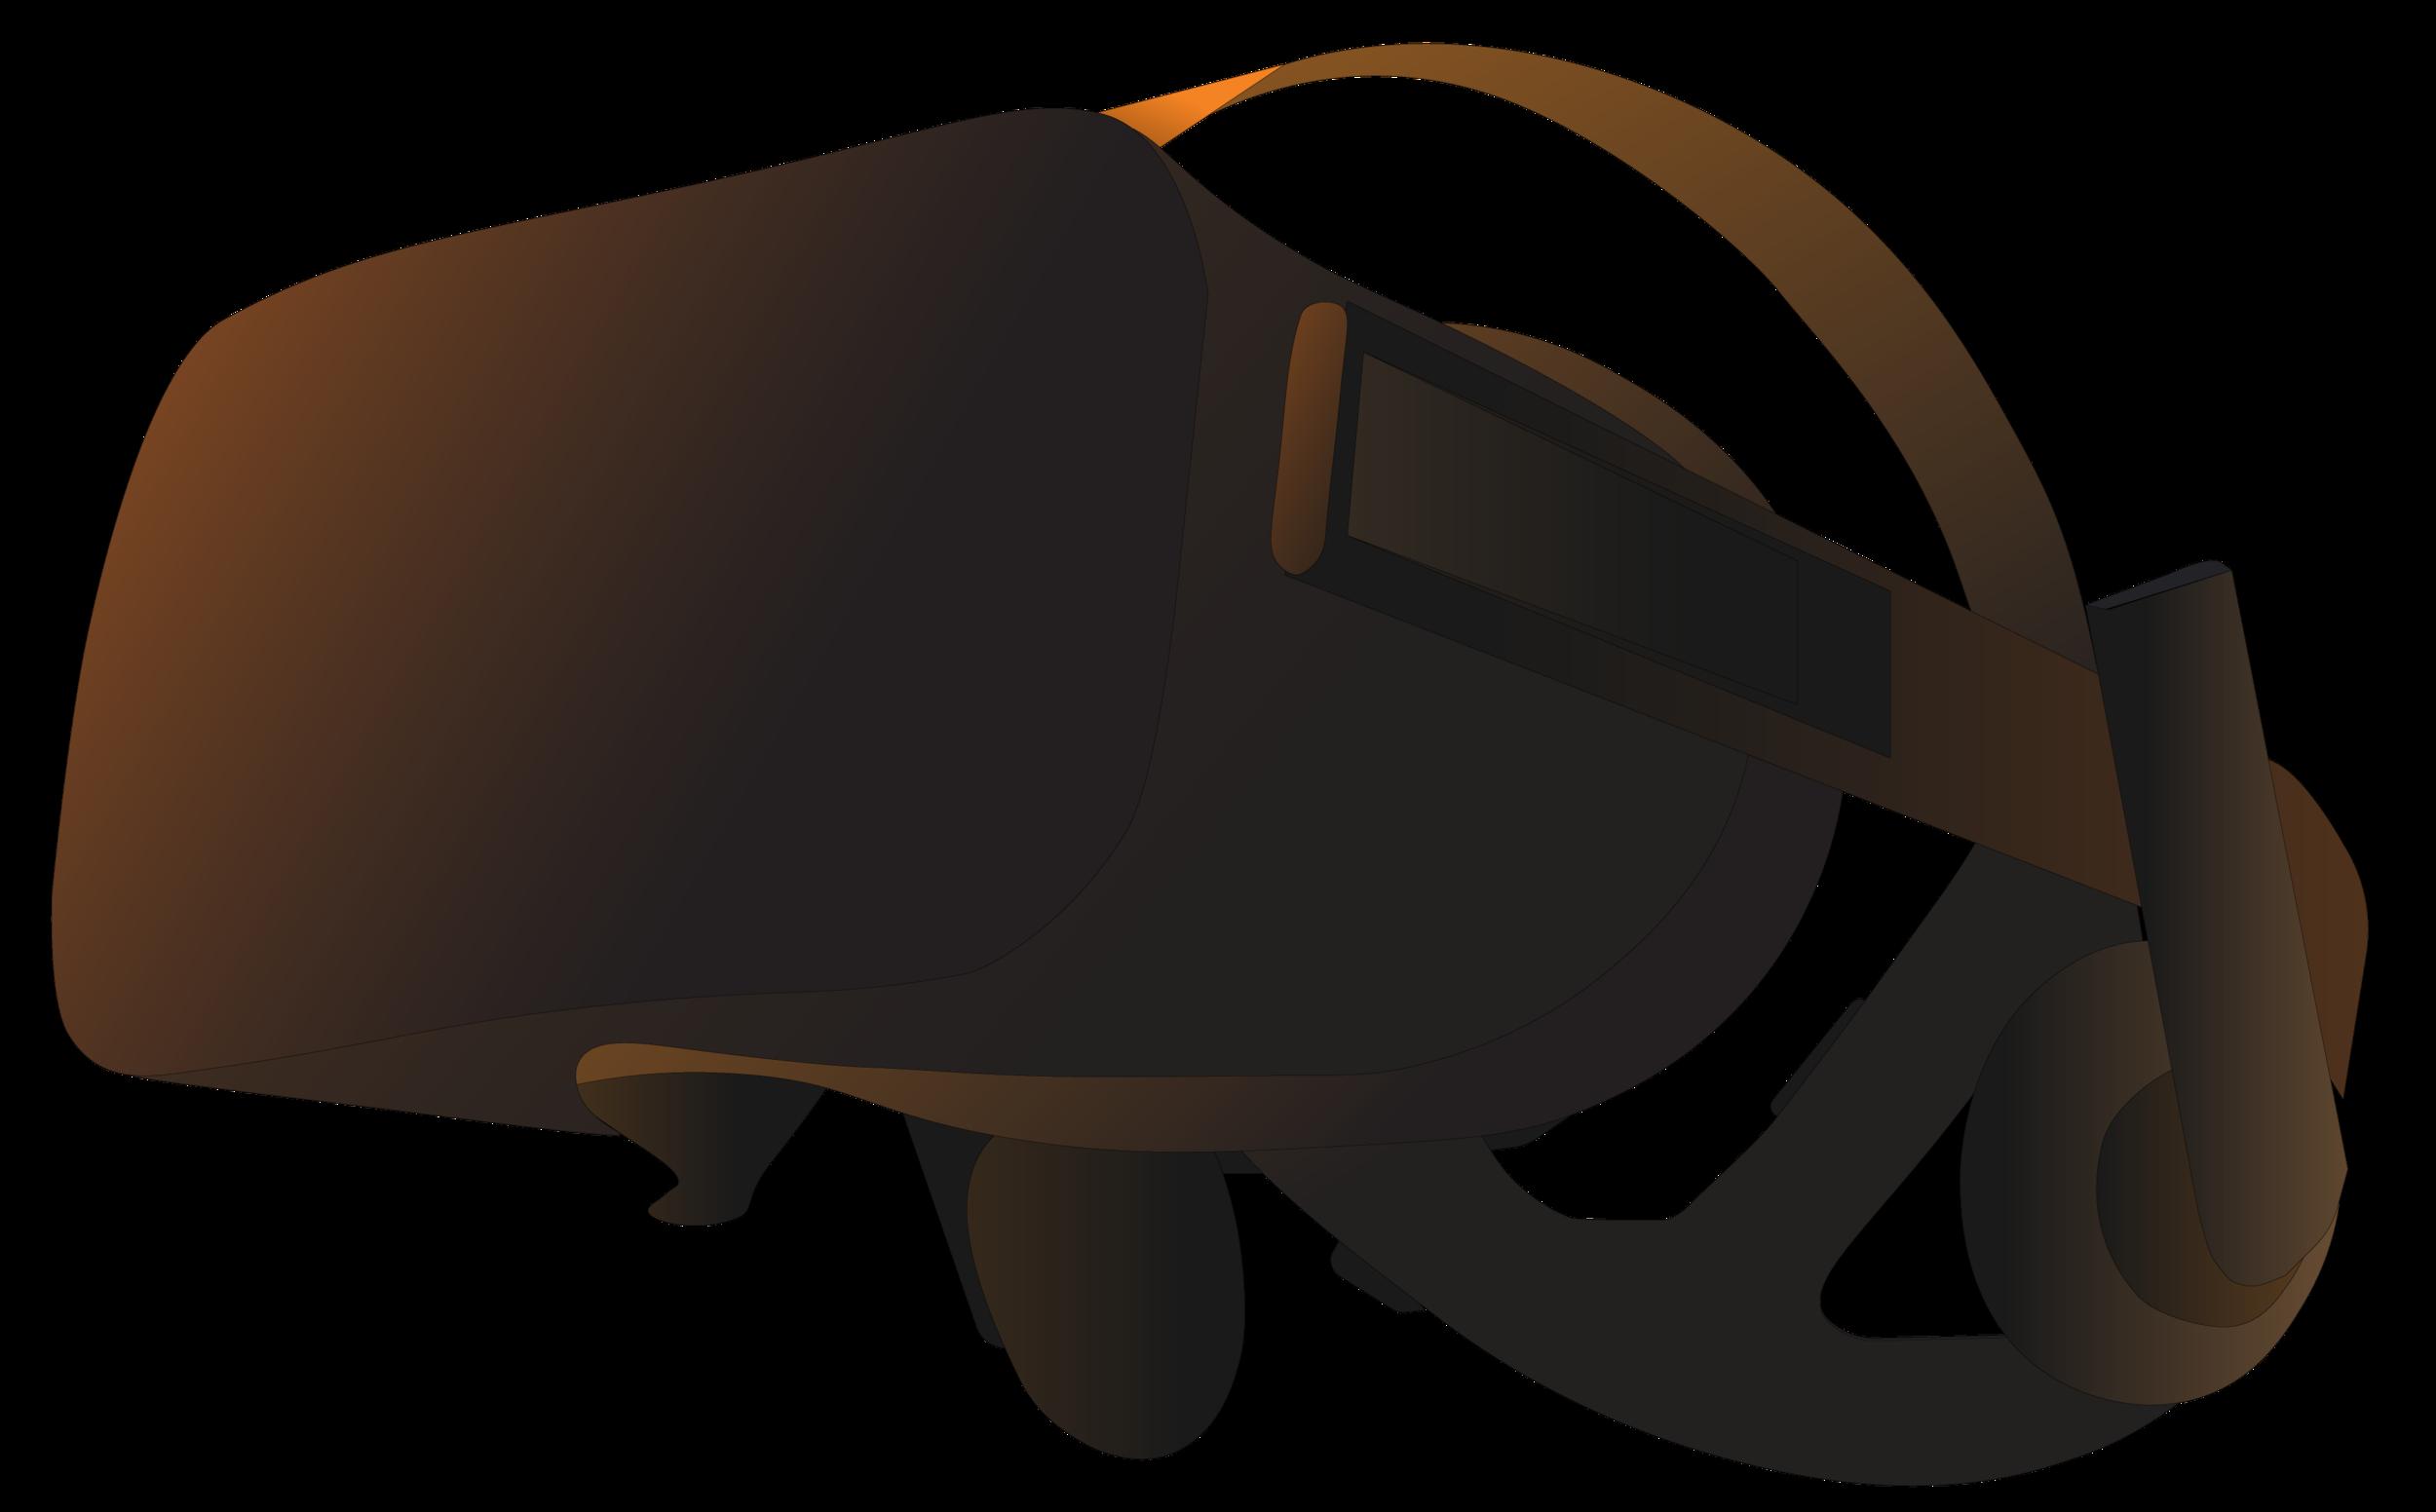 OculusRift_Header_Illustration_by_Brandi_Madar.png